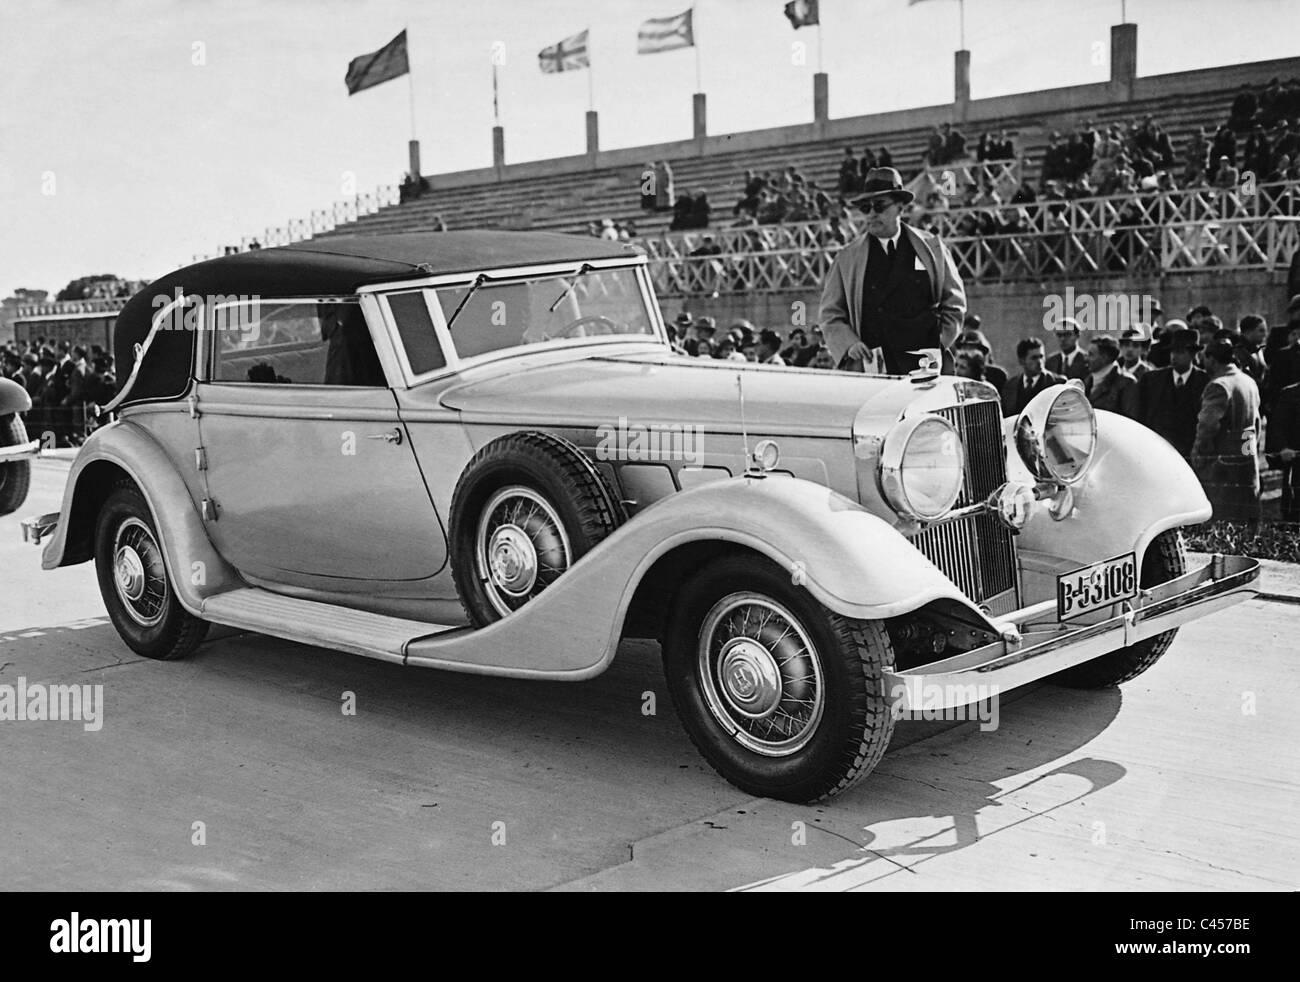 Auto Union Black and White Stock Photos & Images - Alamy